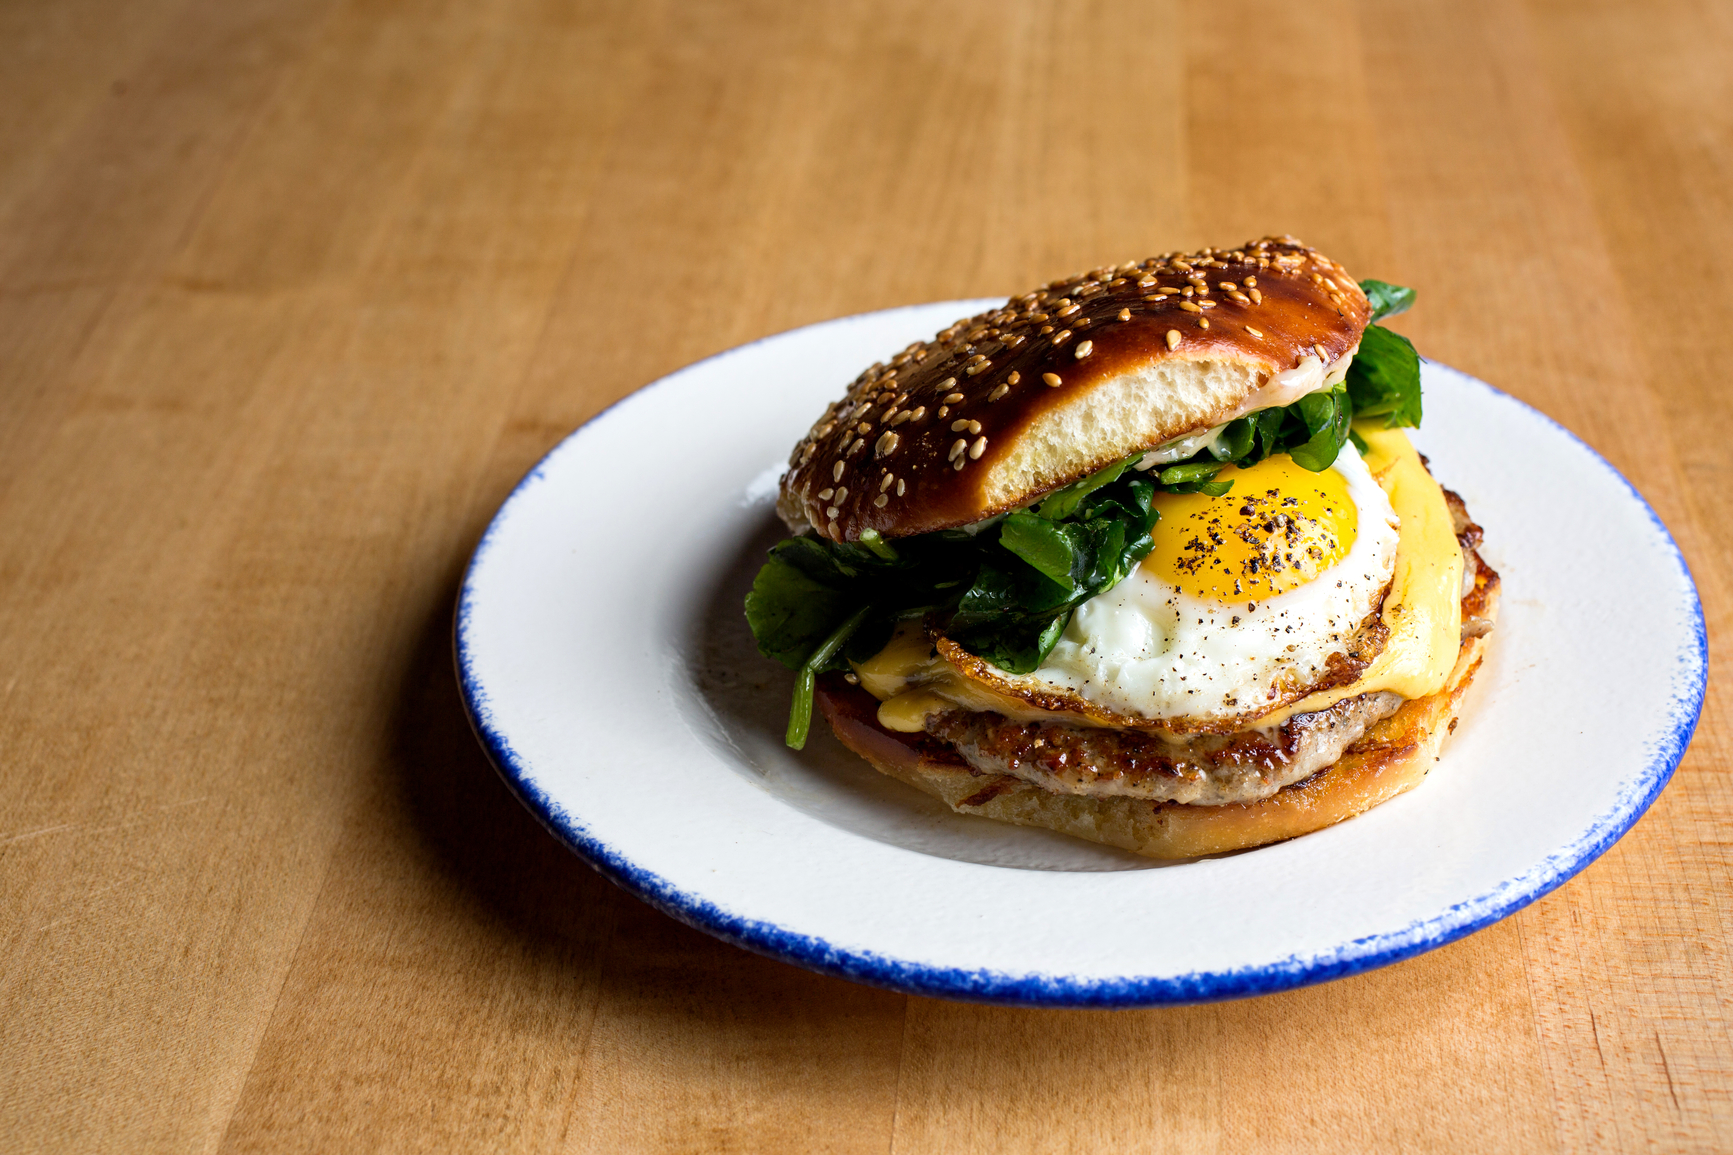 Sausage+Breakfast+Sandwich.jpg